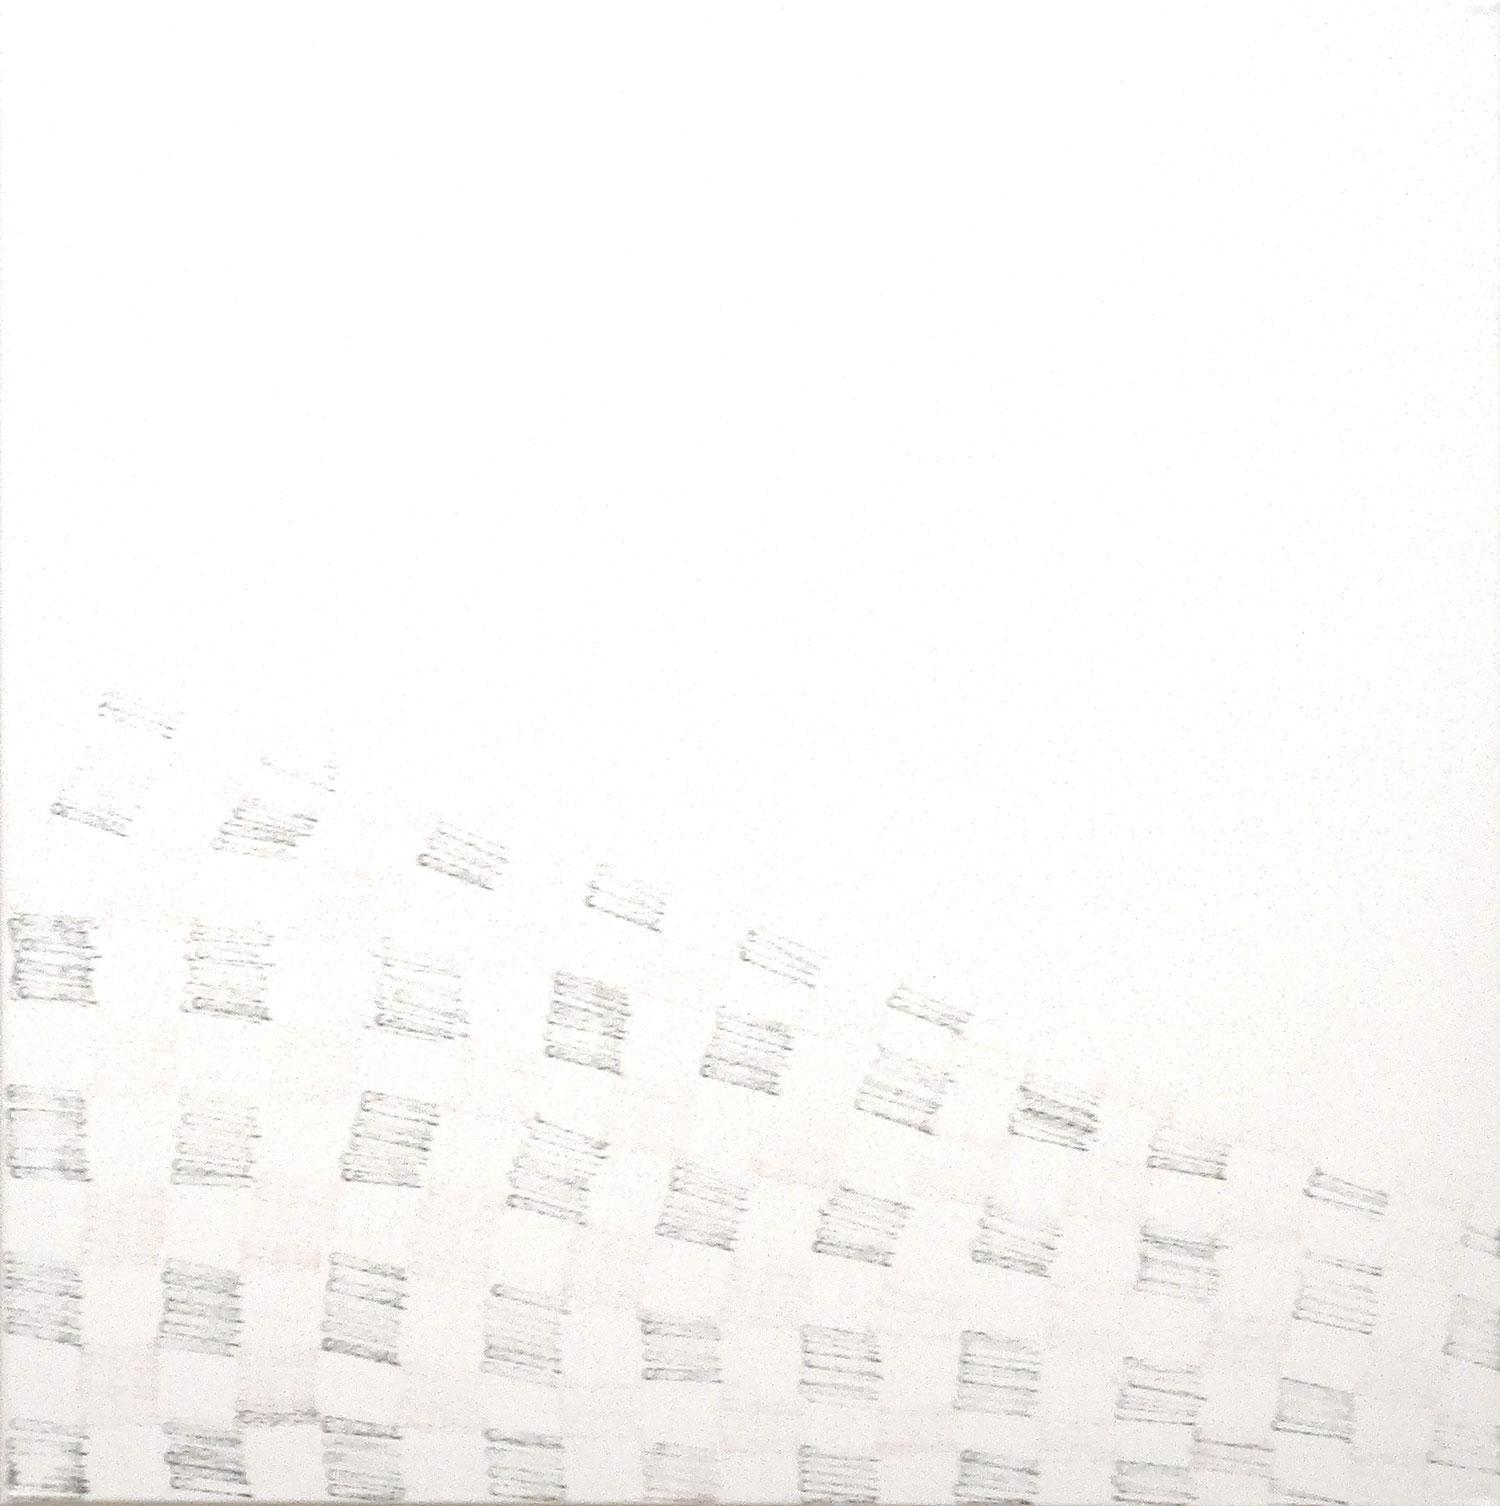 Zeitlos 1985  Oswald Oberhuber   Mixed media on canvas 70x70cm